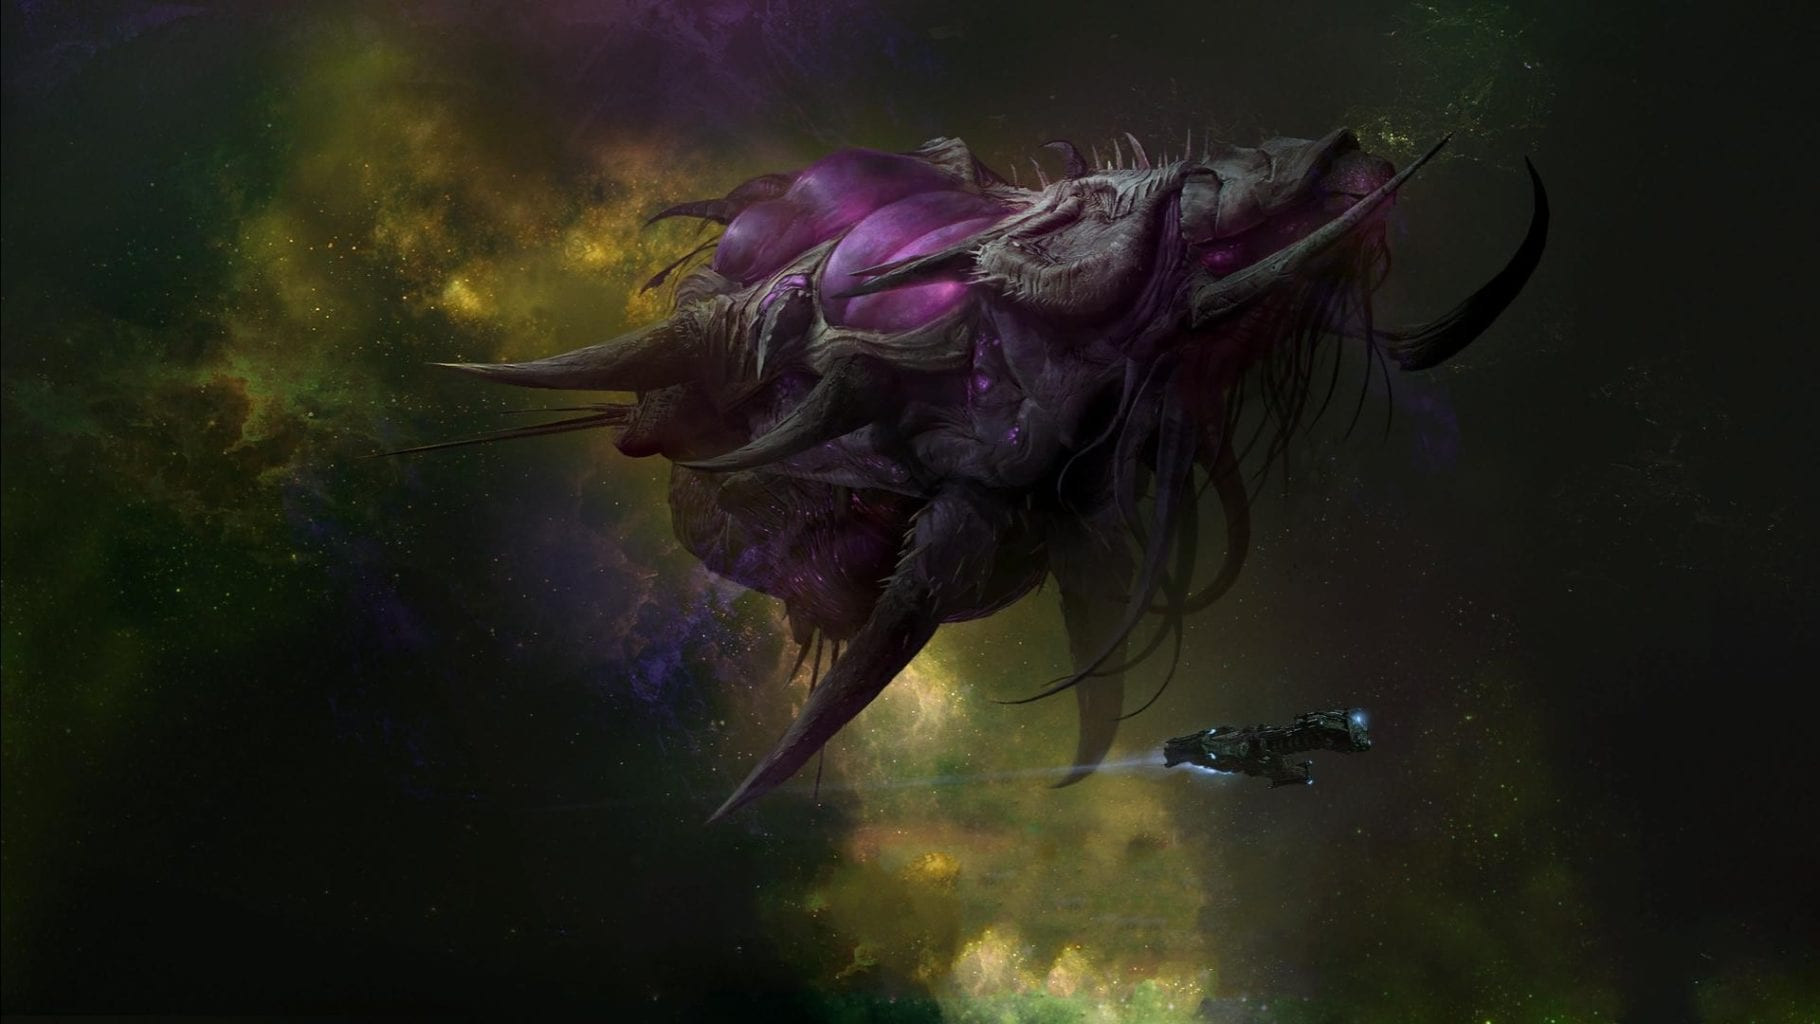 Skytoss vs Zerg - Leviathan